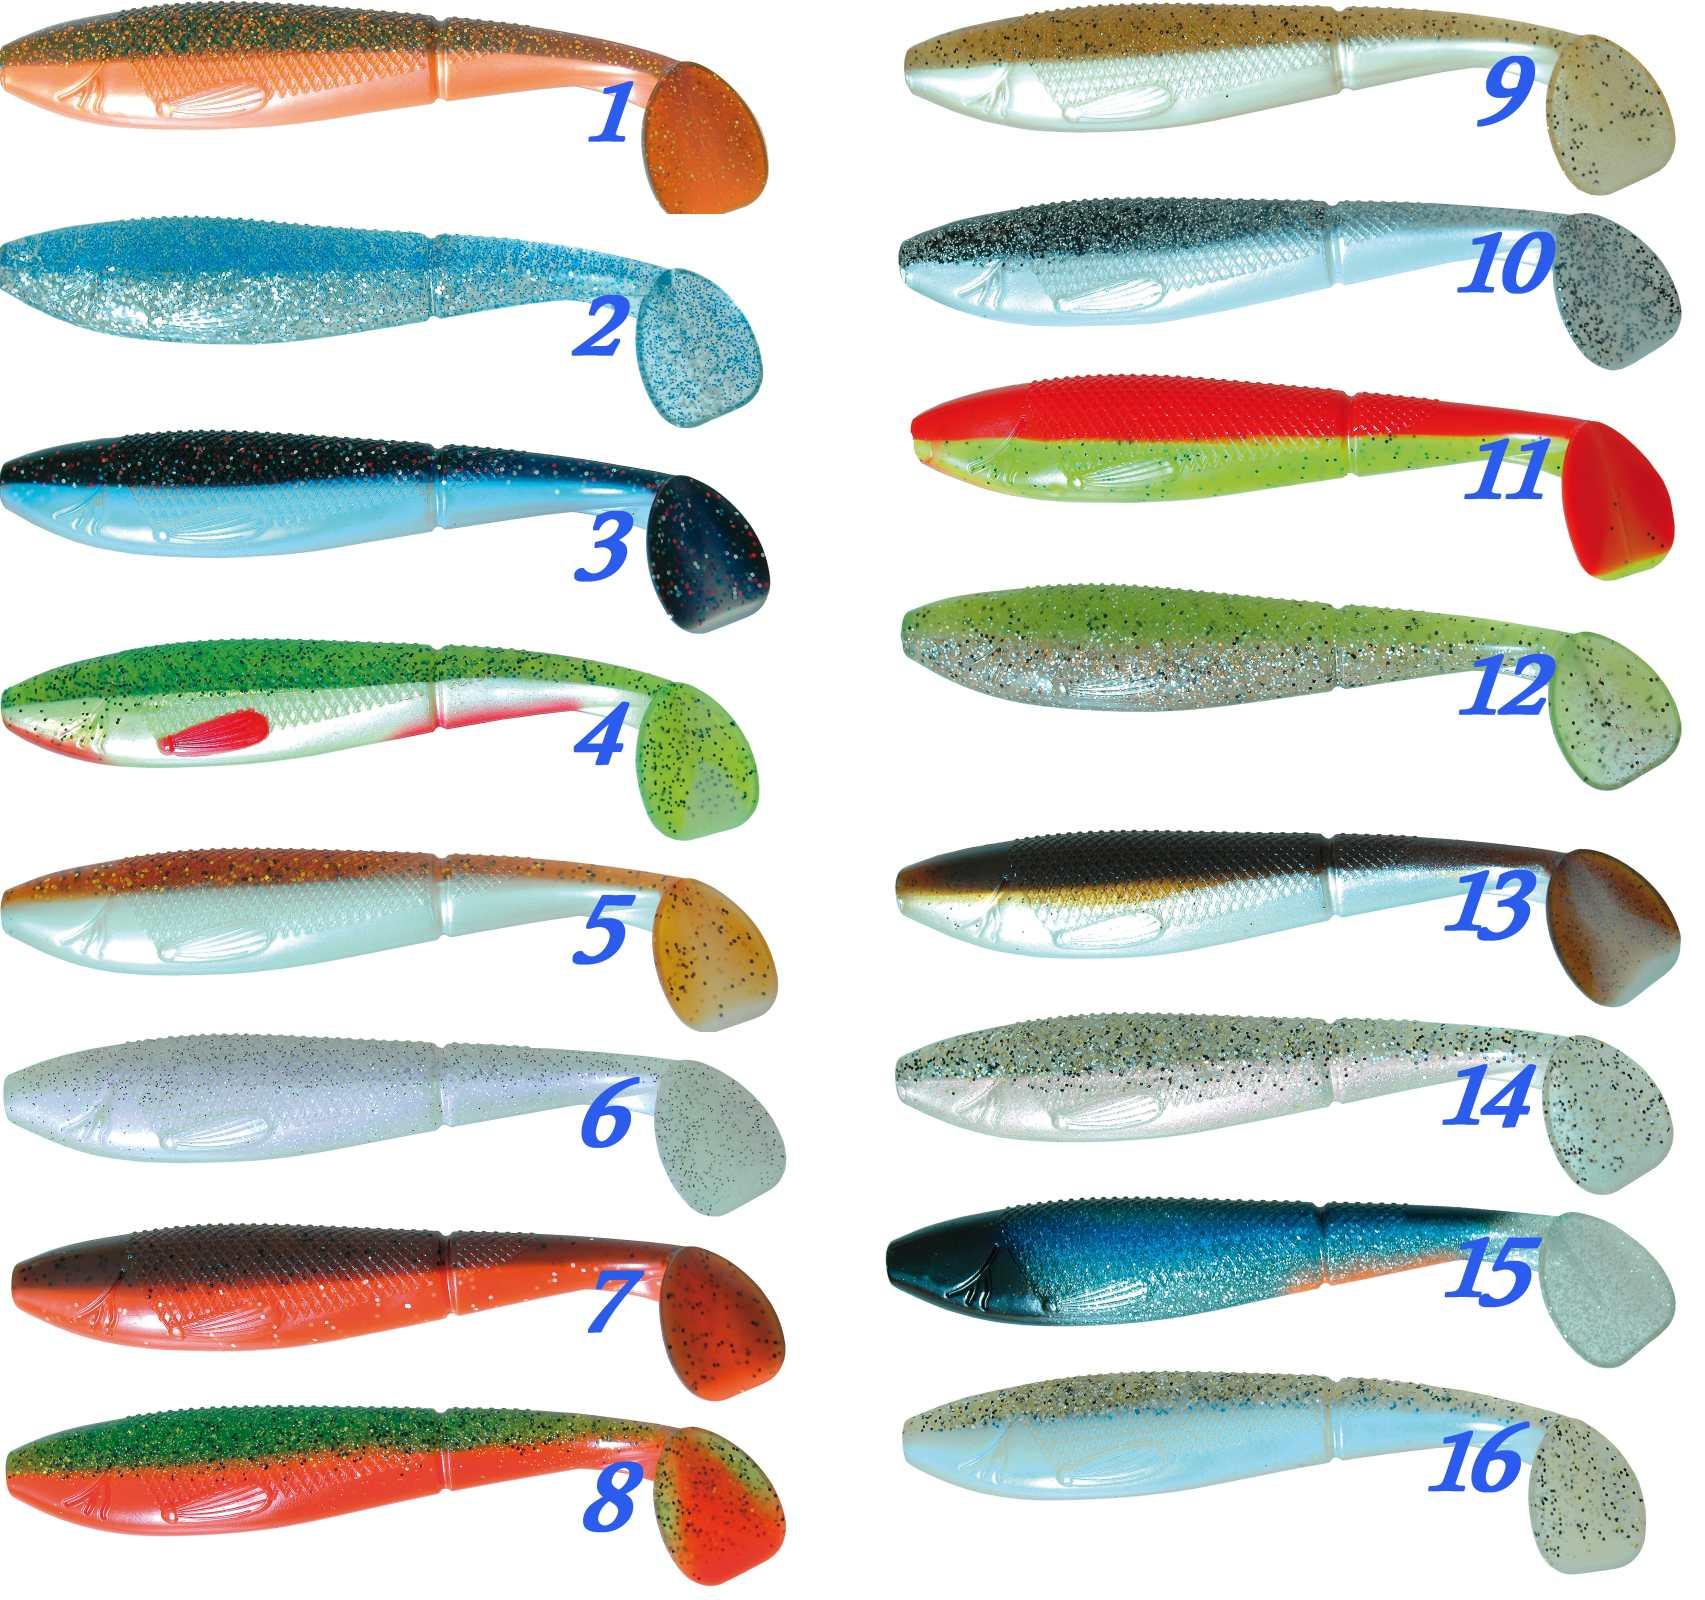 Gumová nástraha Atoka Scaler 10cm / 3ks rybí aroma, riper - zvìtšit obrázek